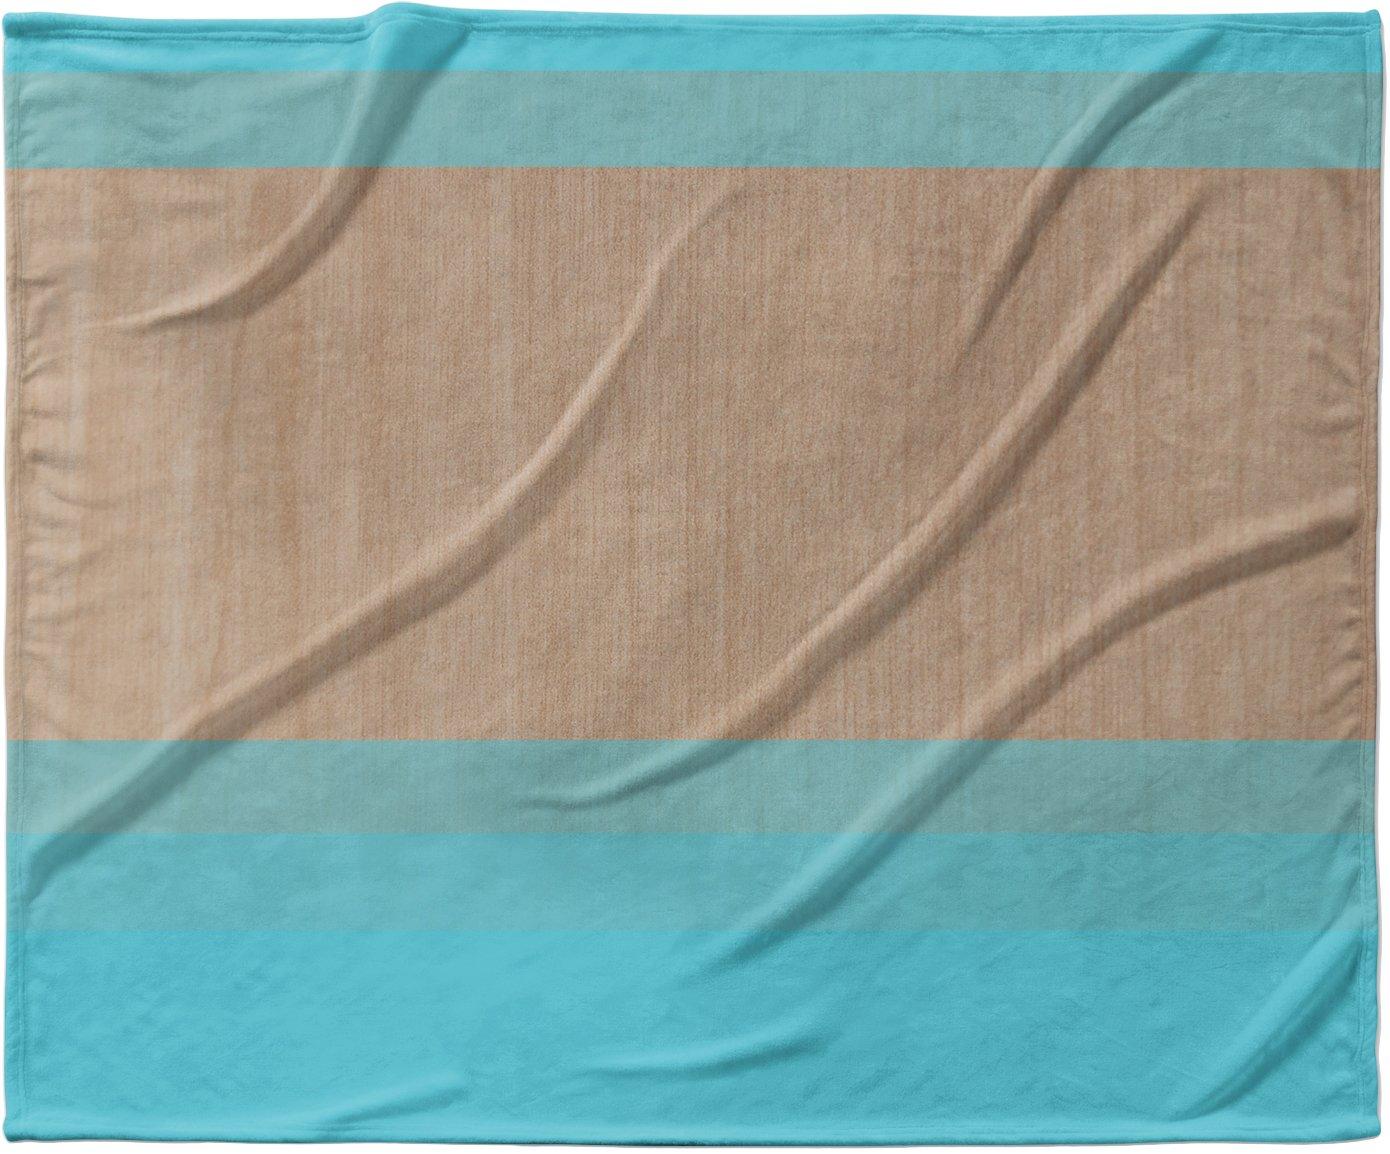 KESS InHouse Brittany Guarino ''Art Blue'' Aqua Wood Fleece Baby Blanket, 40'' x 30''